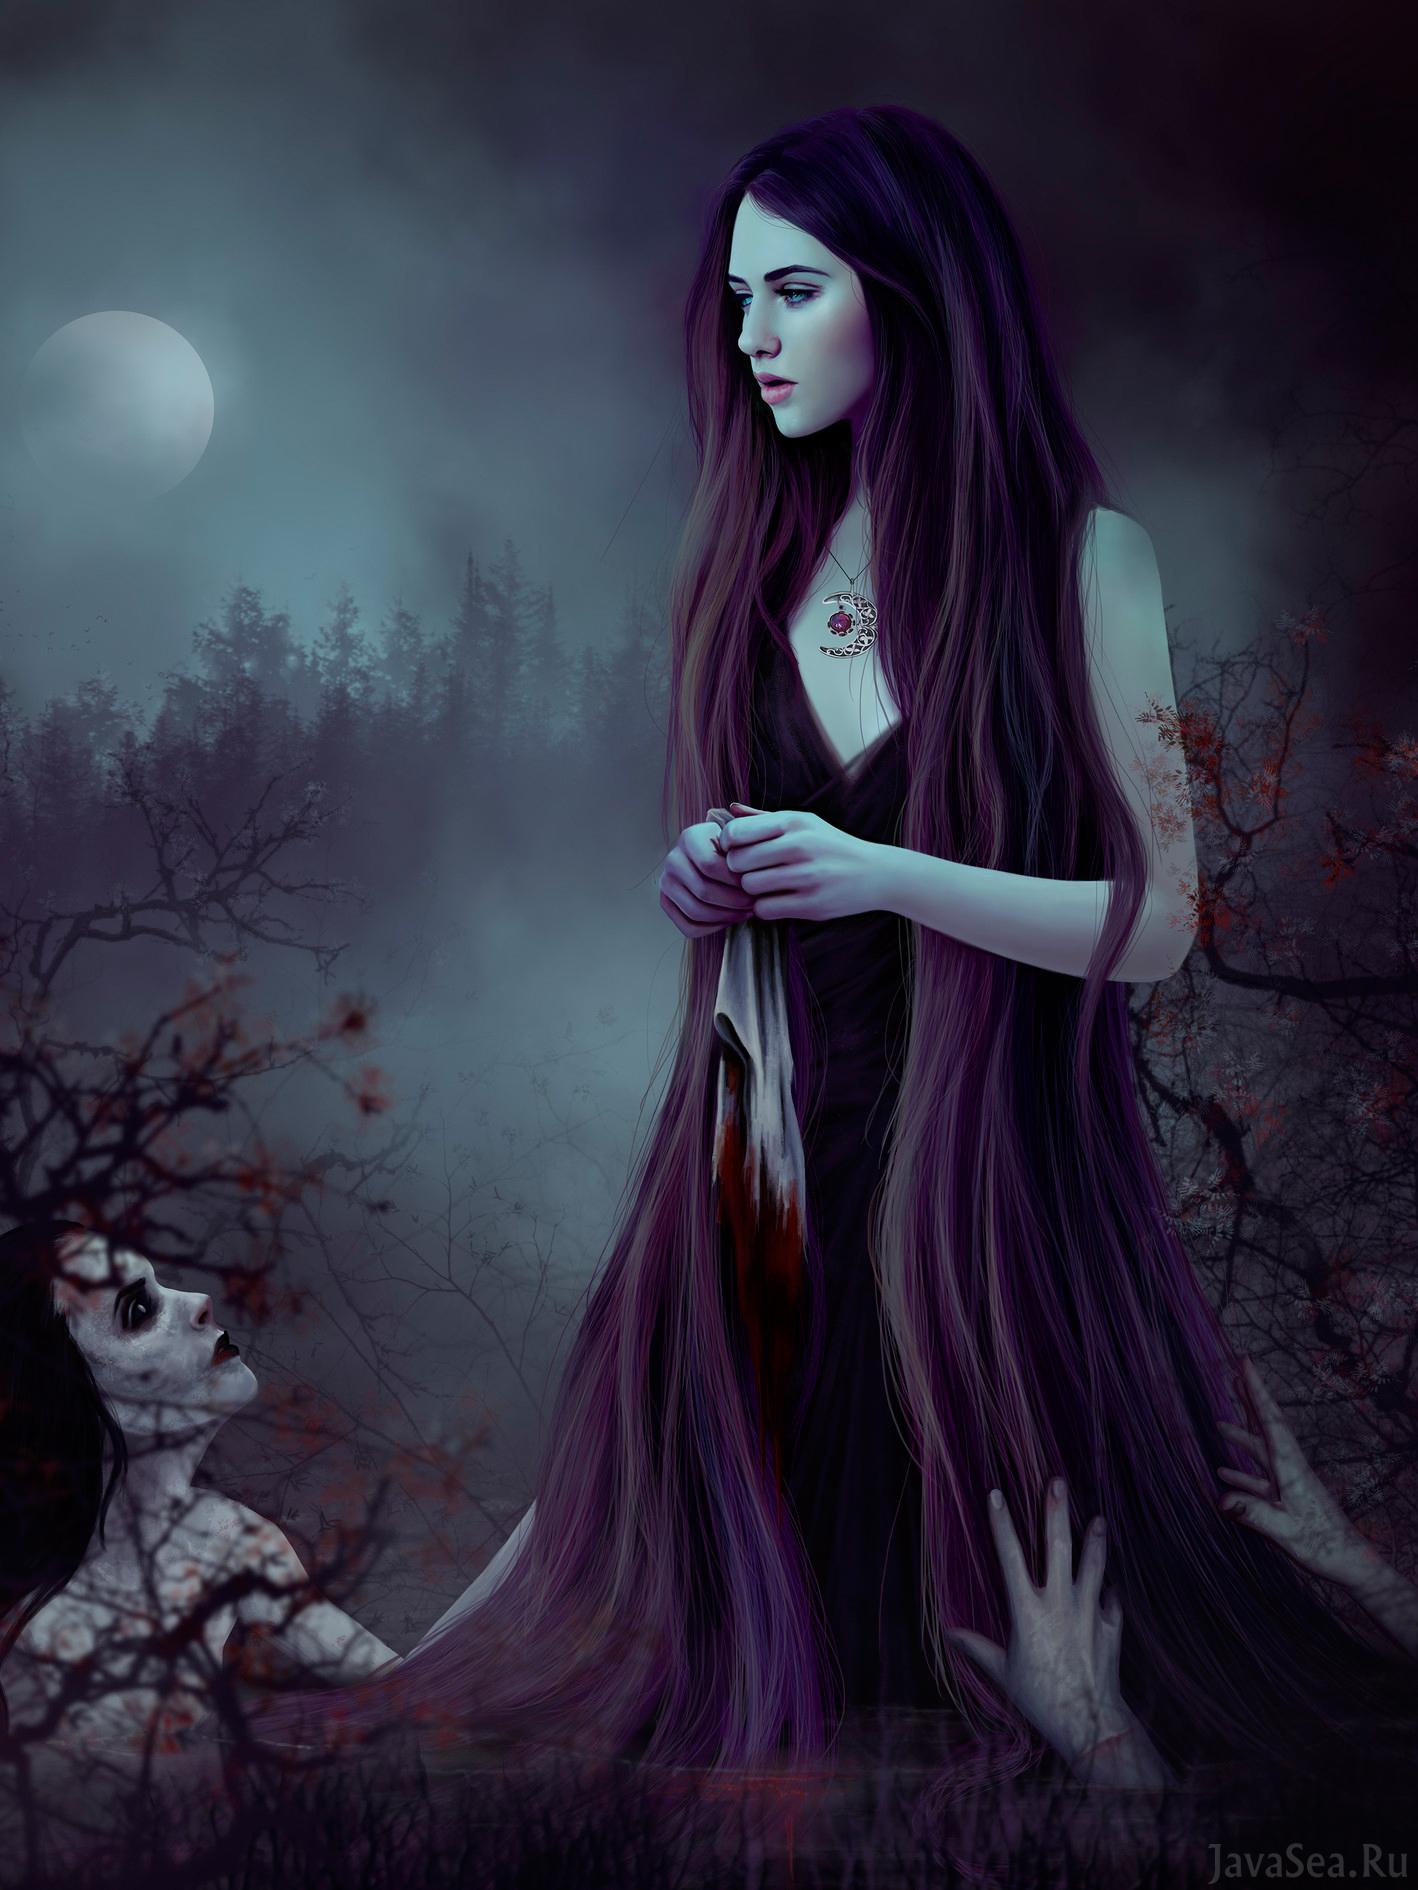 Картинки призрак девочки